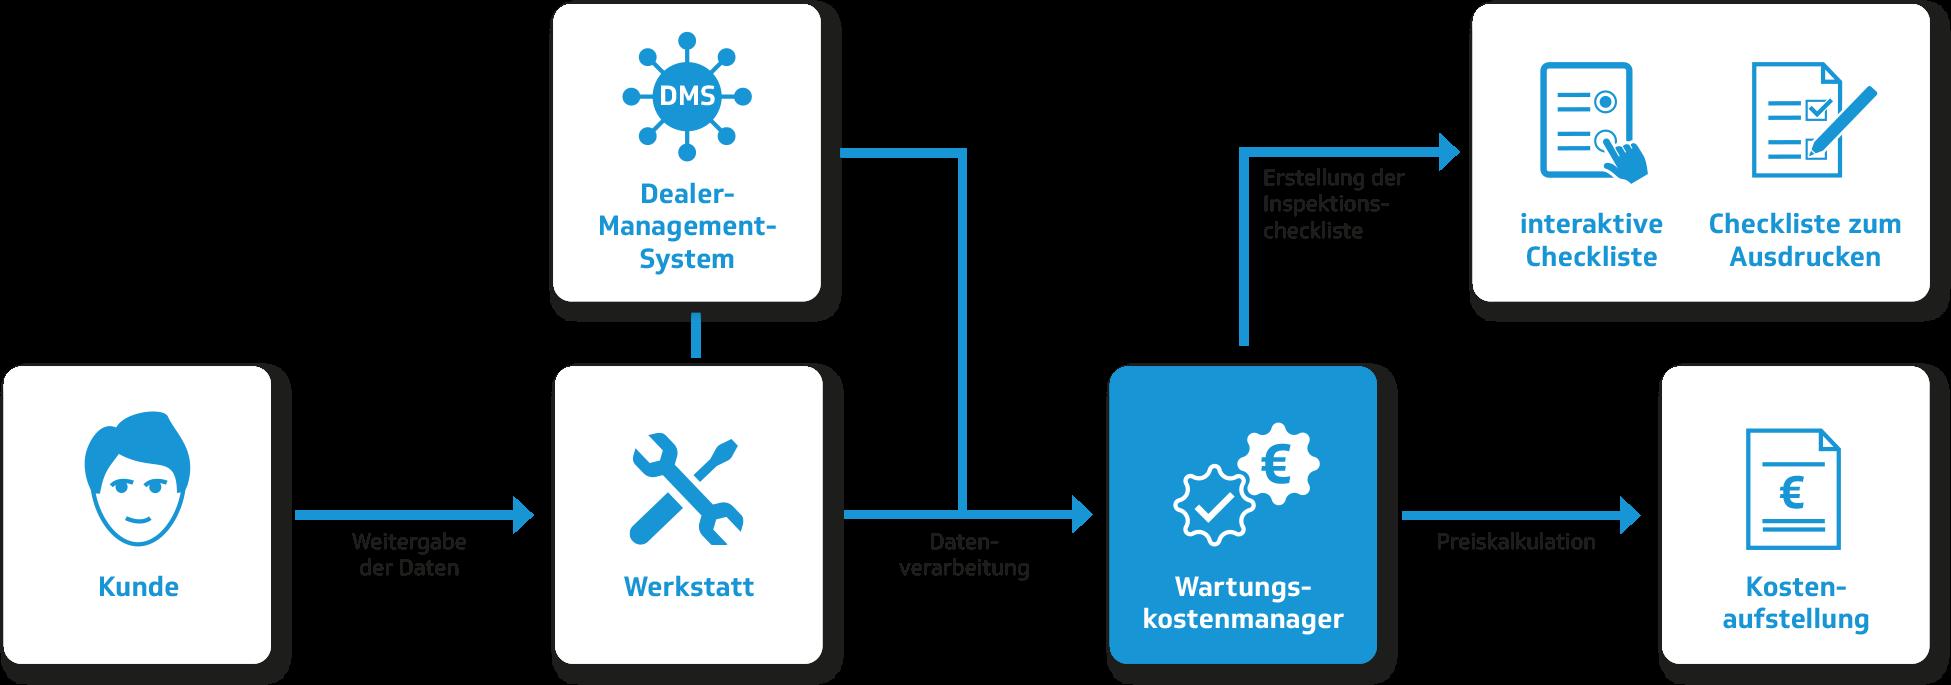 Wartungskostenmanager - Funktionsweise | advasco GmbH